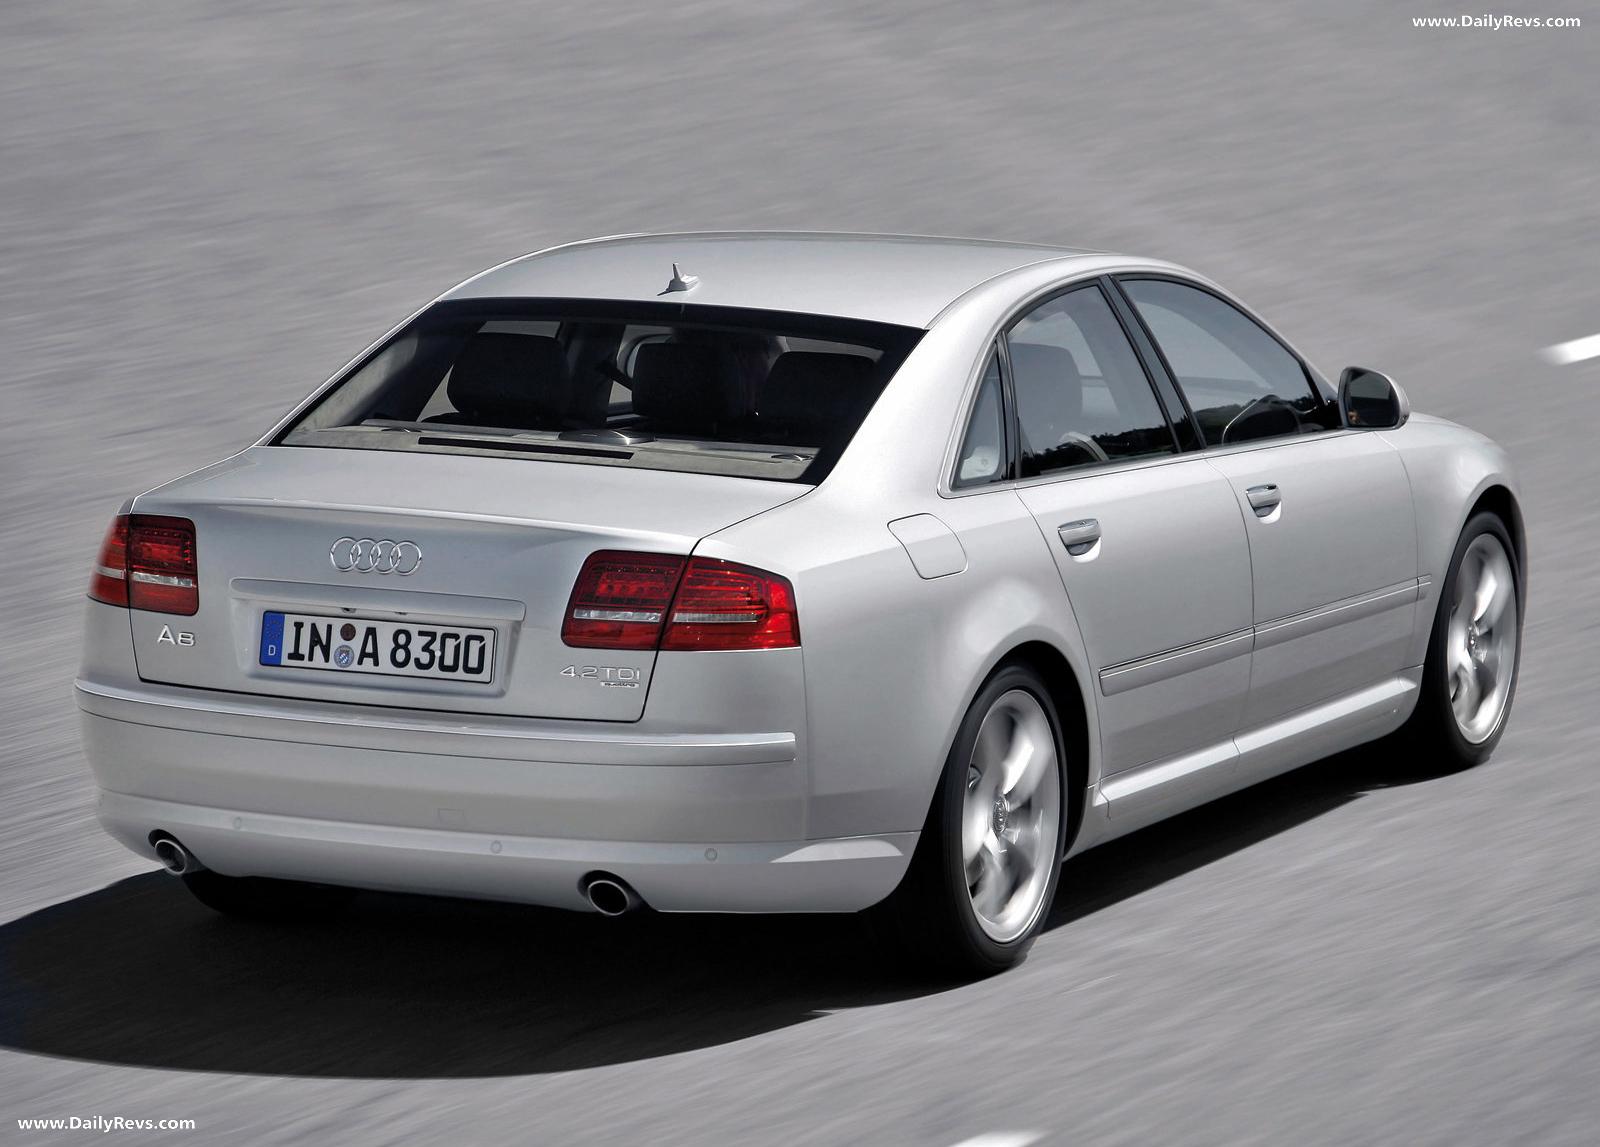 2008 Audi A8 4.2 TDI quattro - HD Pictures, Videos, Specs ...